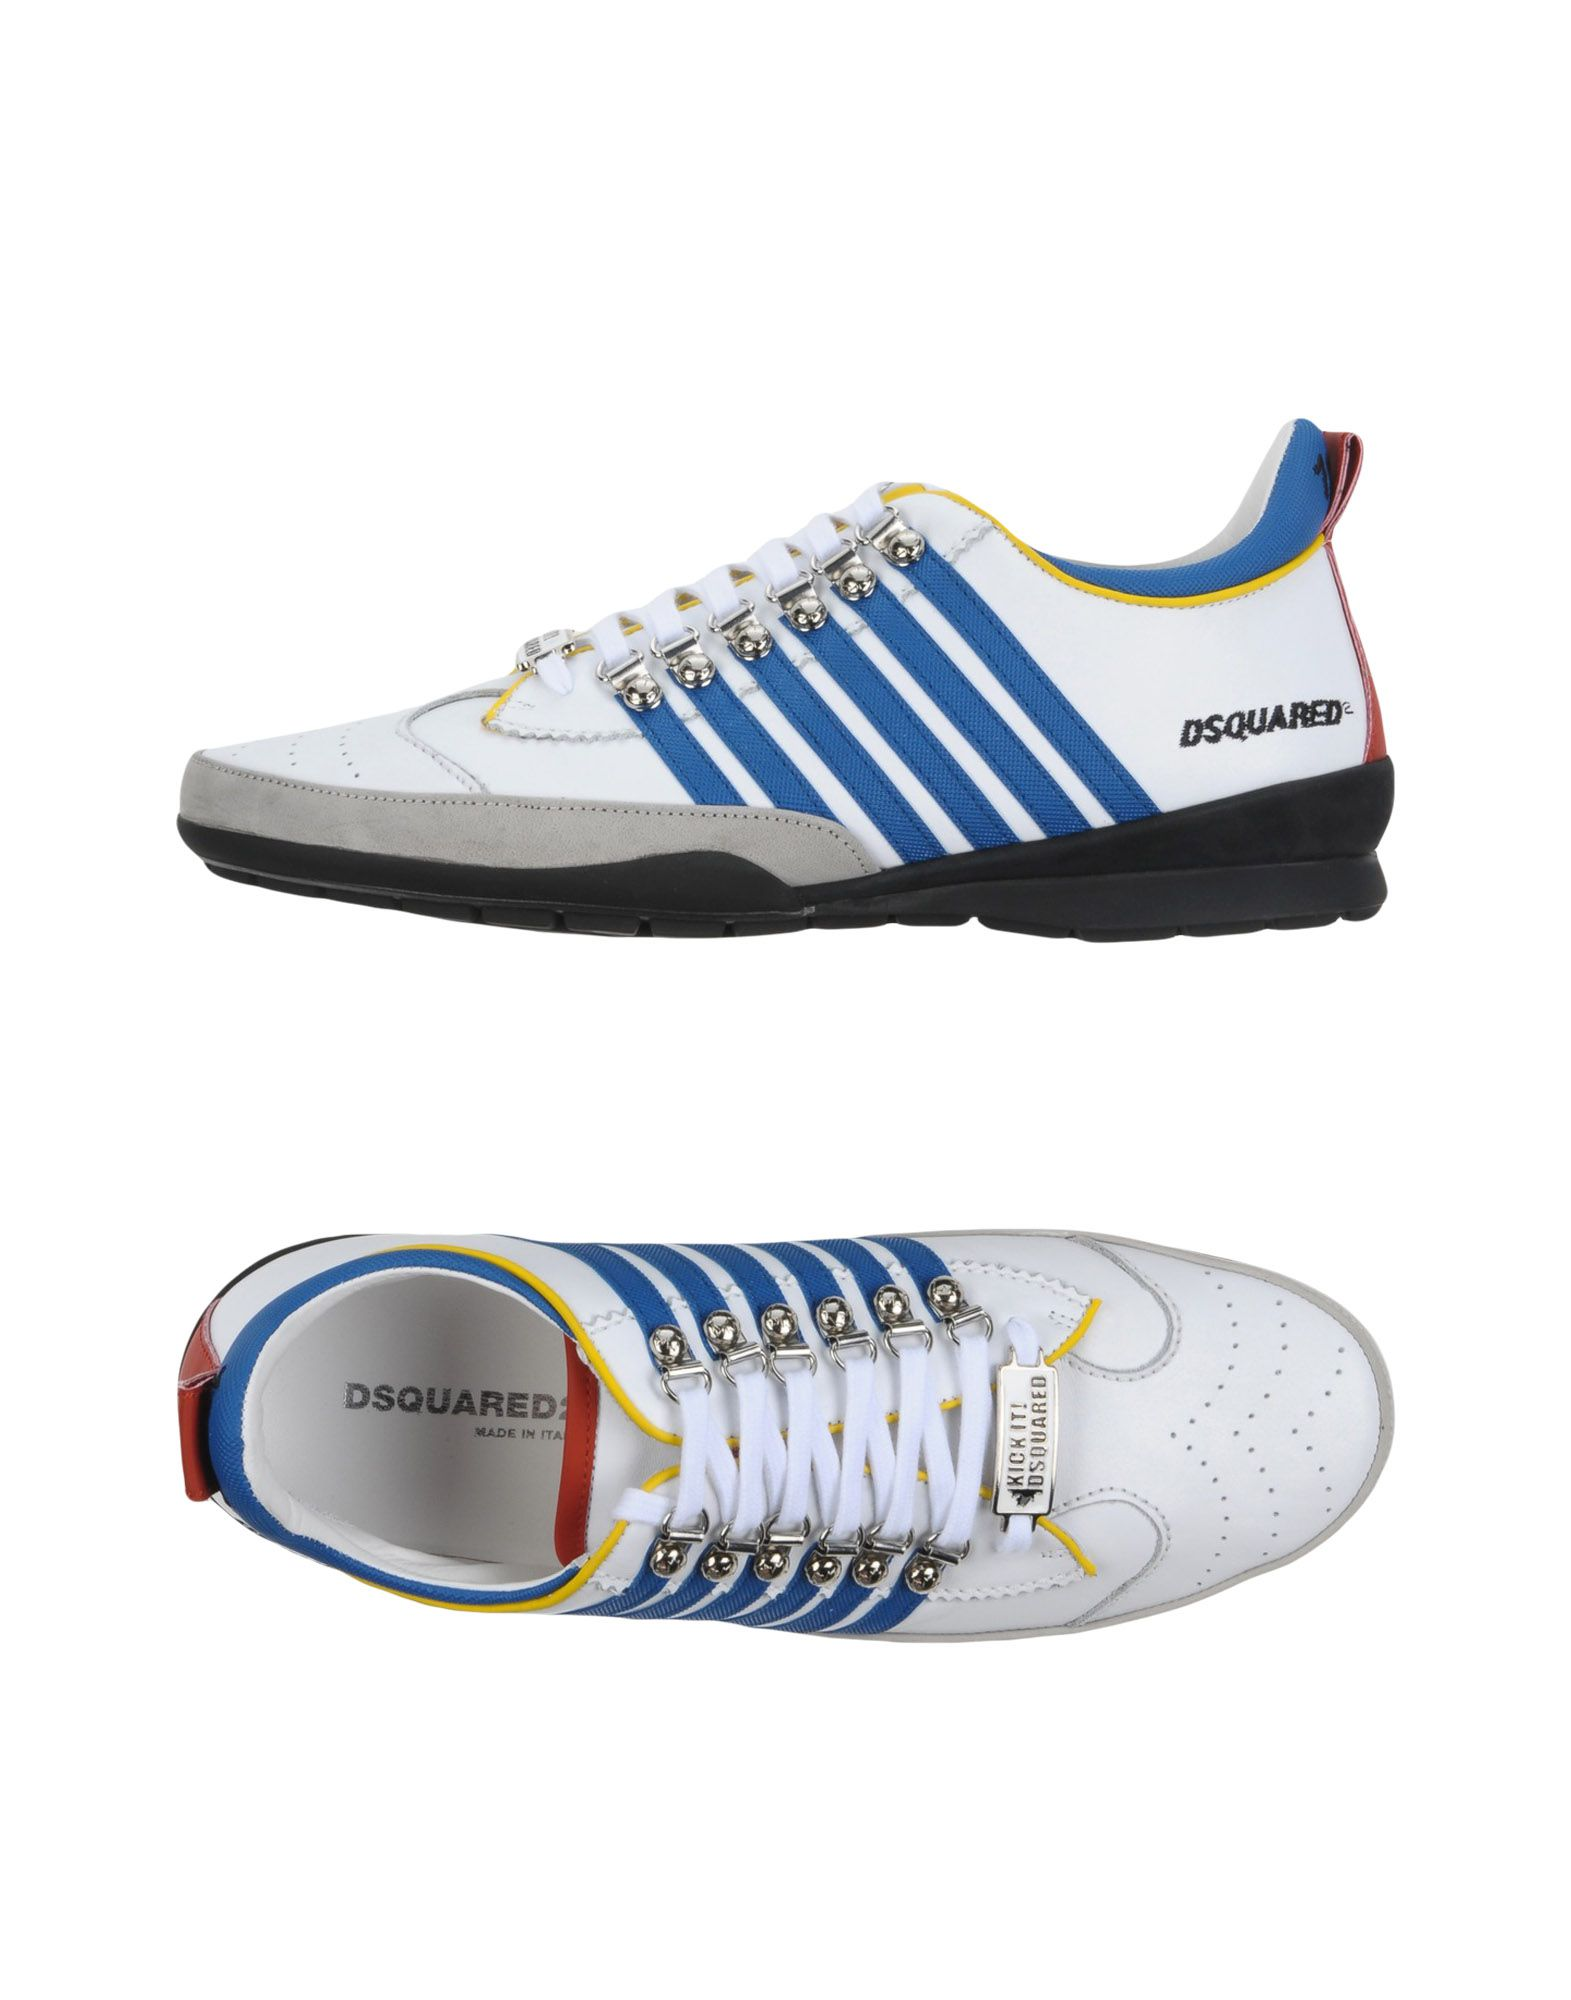 Dsquared2 Sneakers Herren  11298670CI Gute Qualität beliebte Schuhe